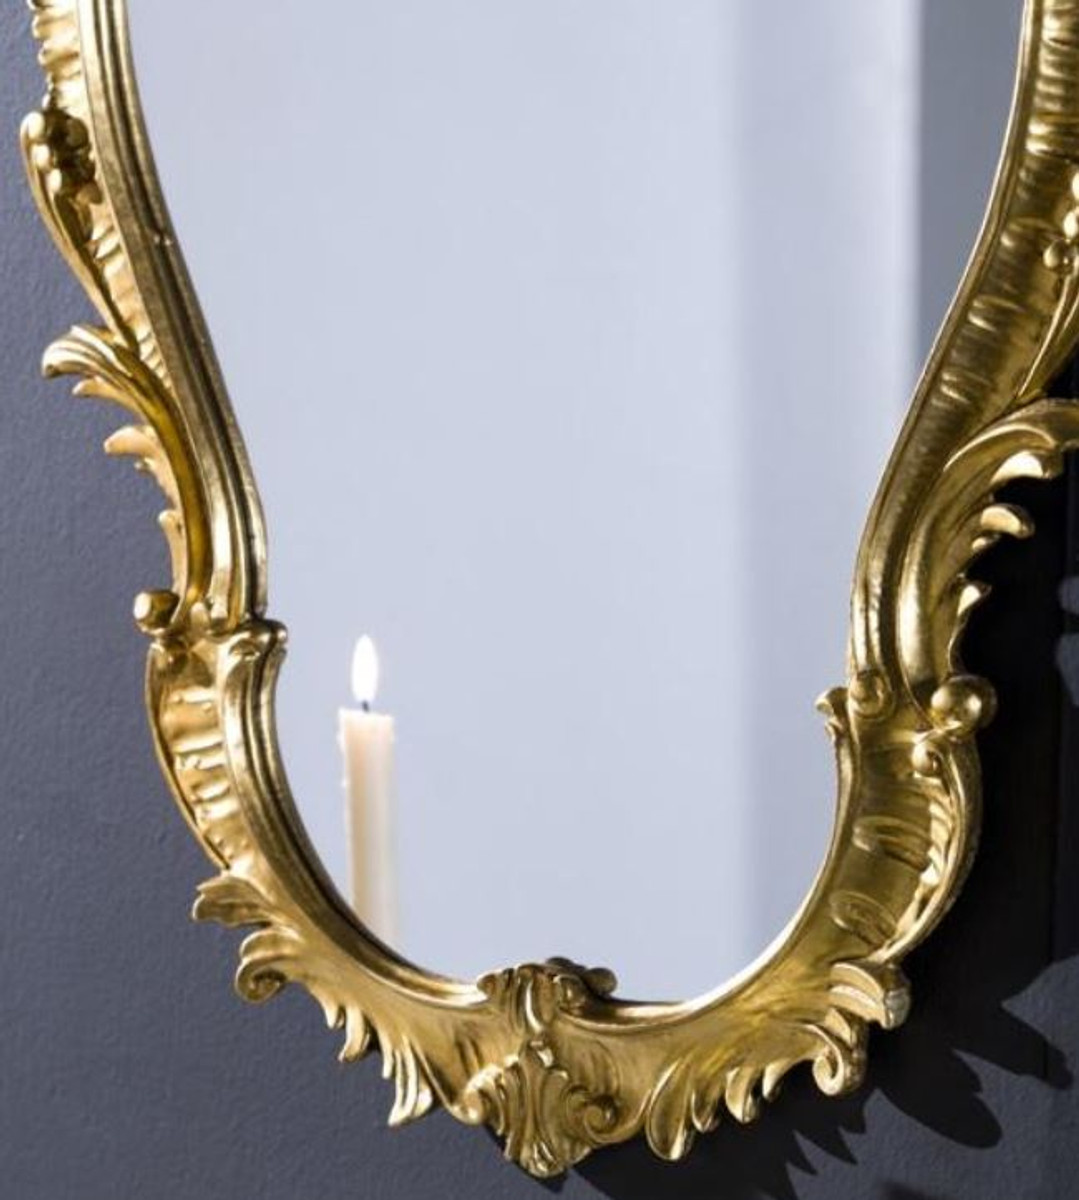 Casa Padrino Luxus Barock Wandspiegel Gold 58 x 4 x H. 98 cm - Prunkvoller Spiegel im Barockstil - Barock Möbel 2